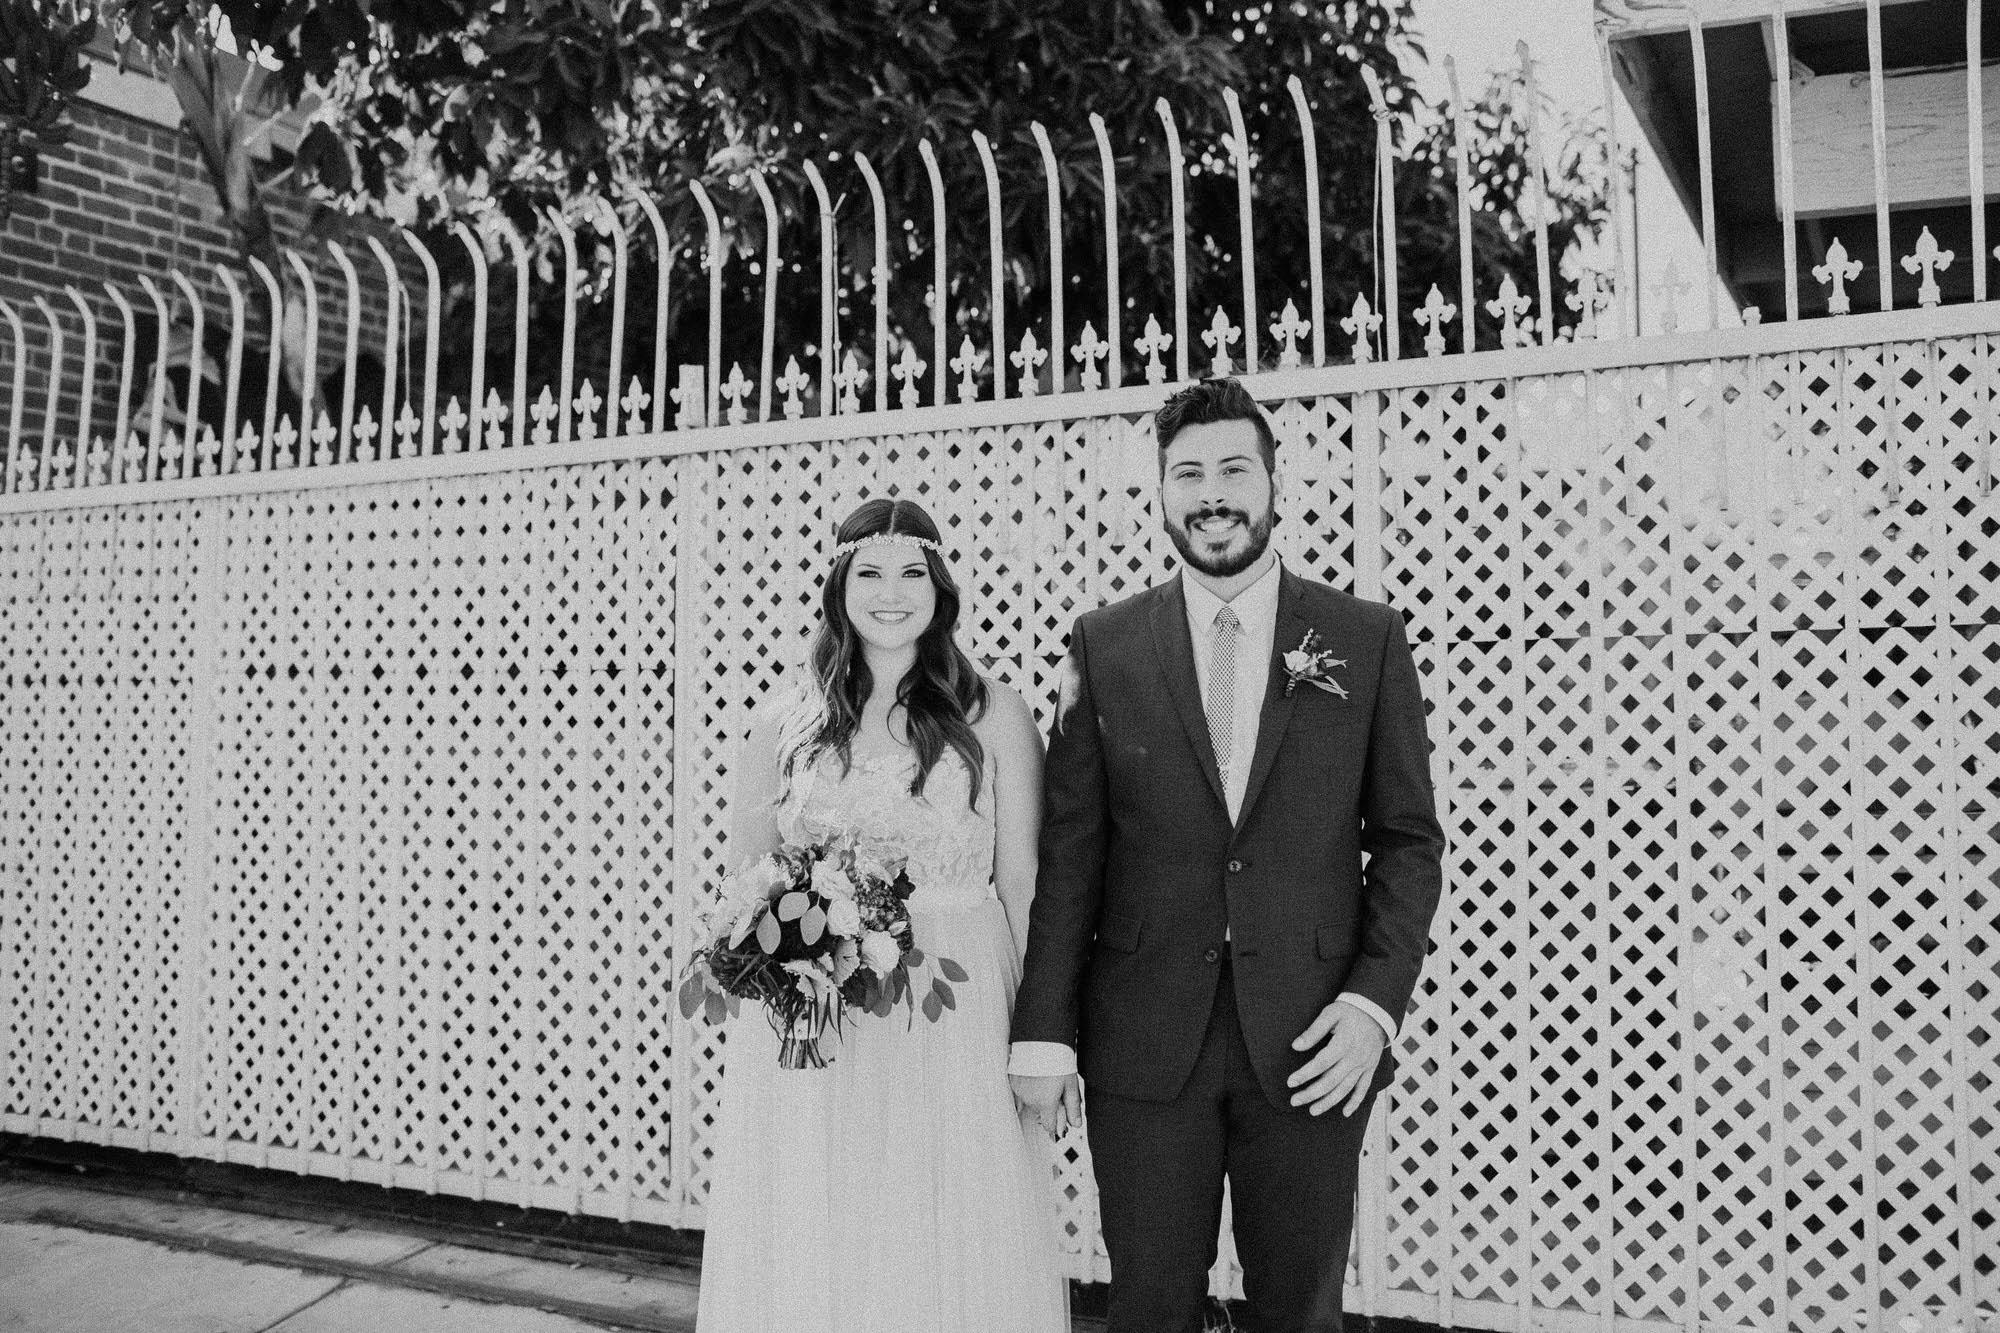 los-angeles-wedding-photographer-kristen-dylan-49.jpg